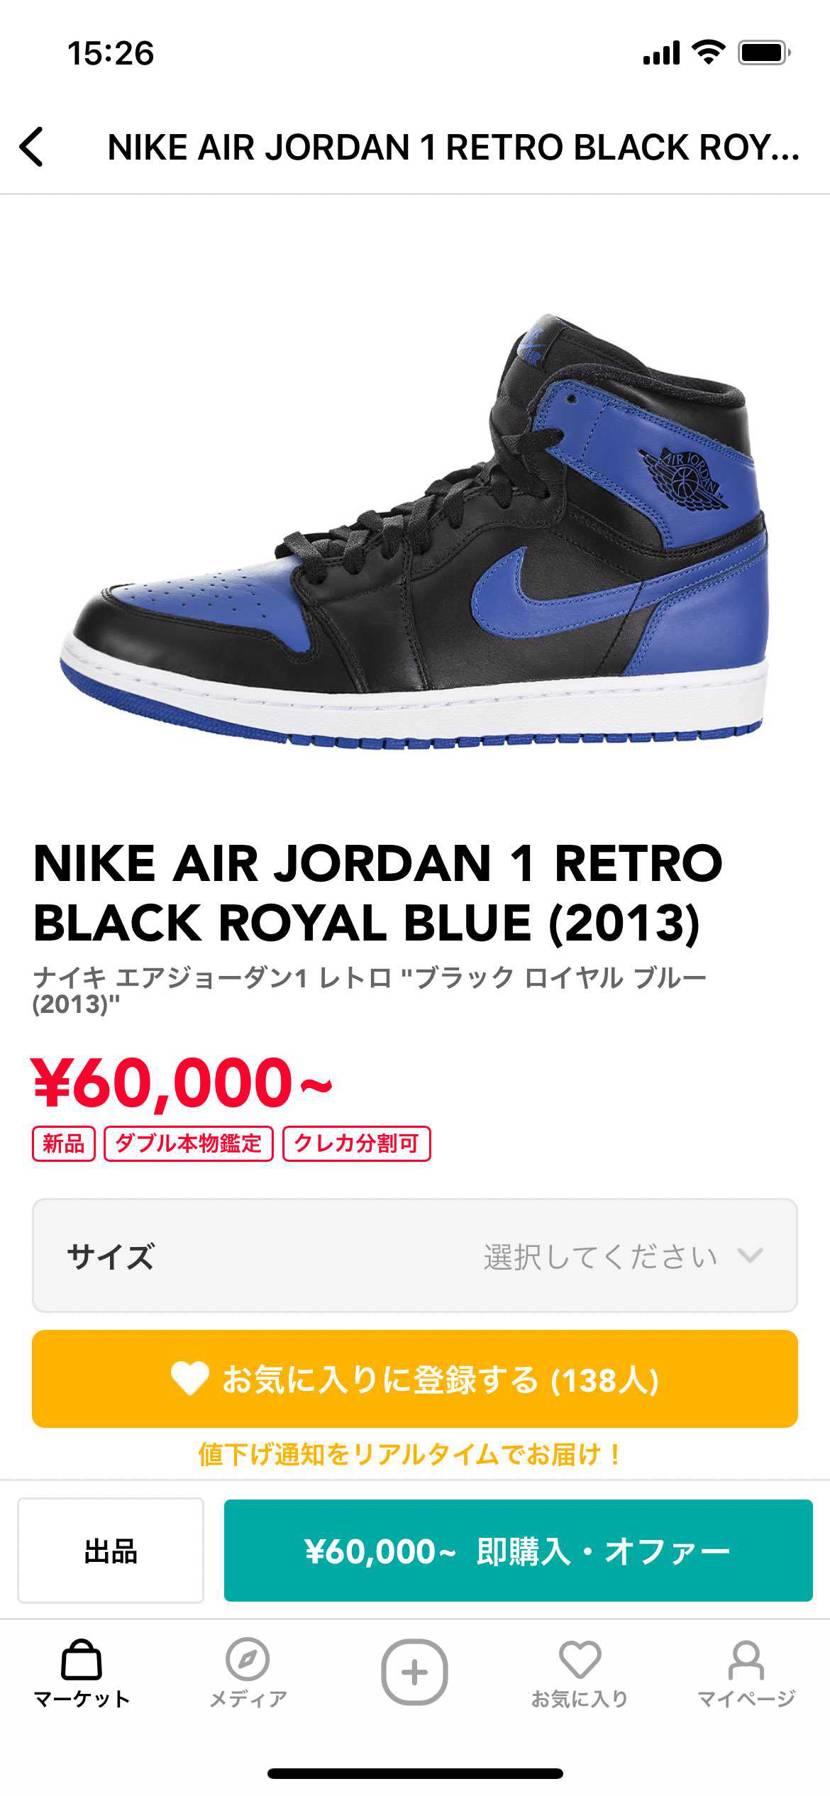 NIKE AIR JORDAN 1 RETRO BLACK ROYAL BLUE